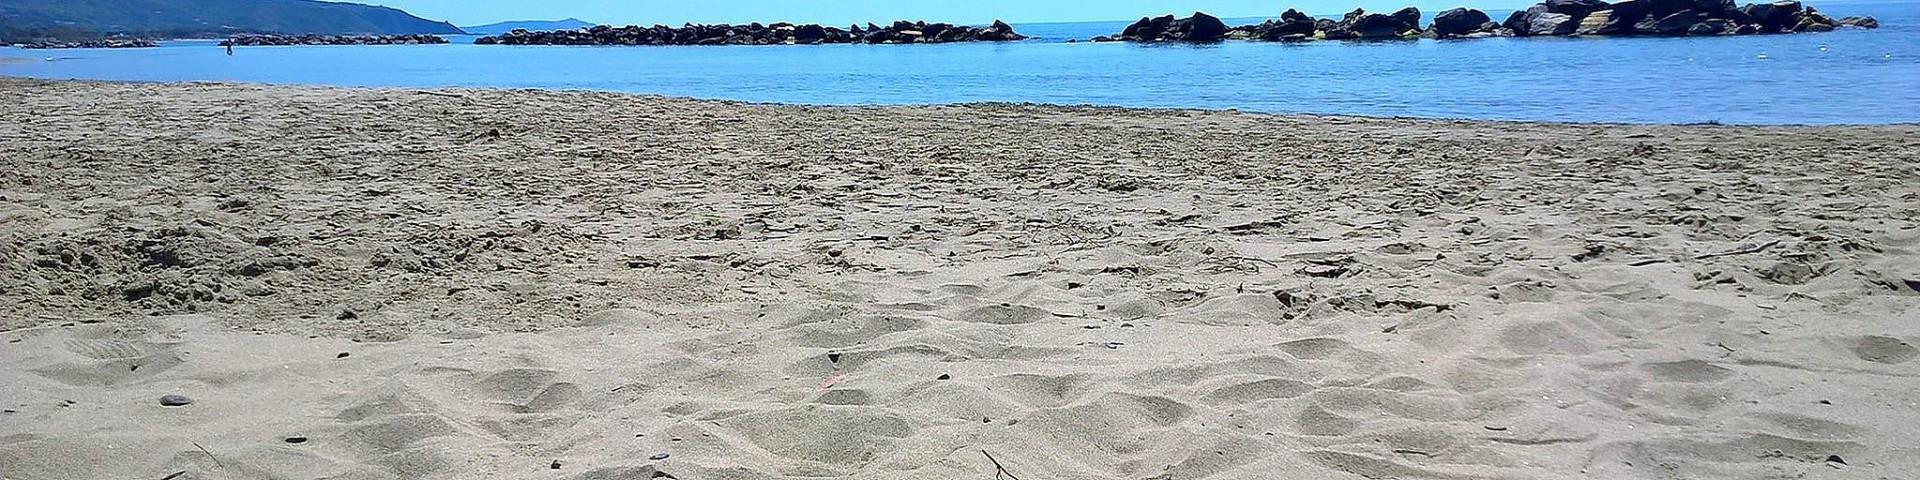 Marina di Casal Velino, typ pláže a písku